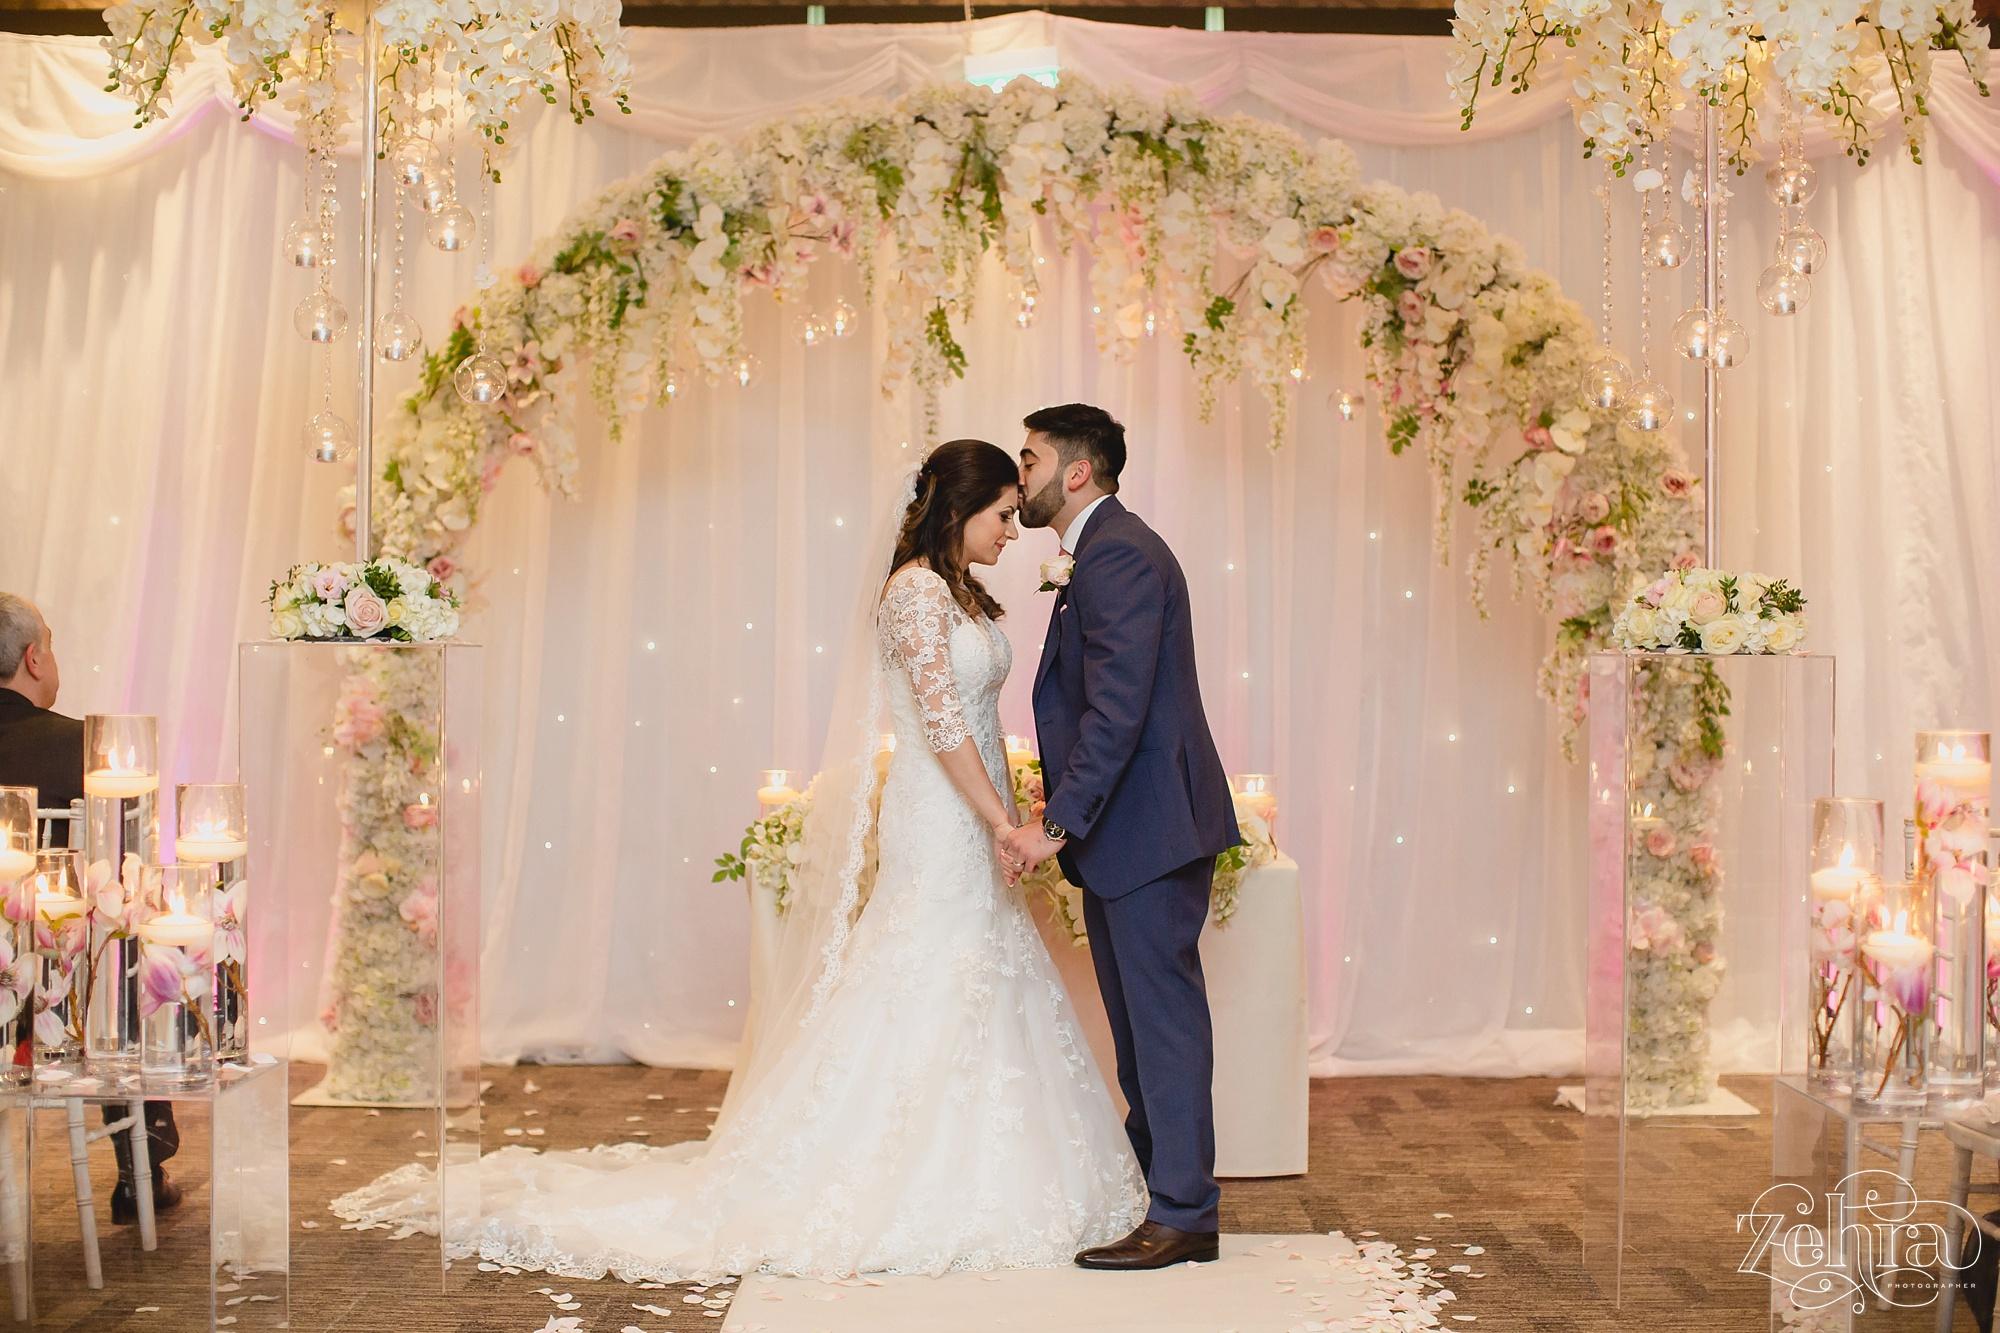 zehra photographer mere cheshire wedding_0017.jpg